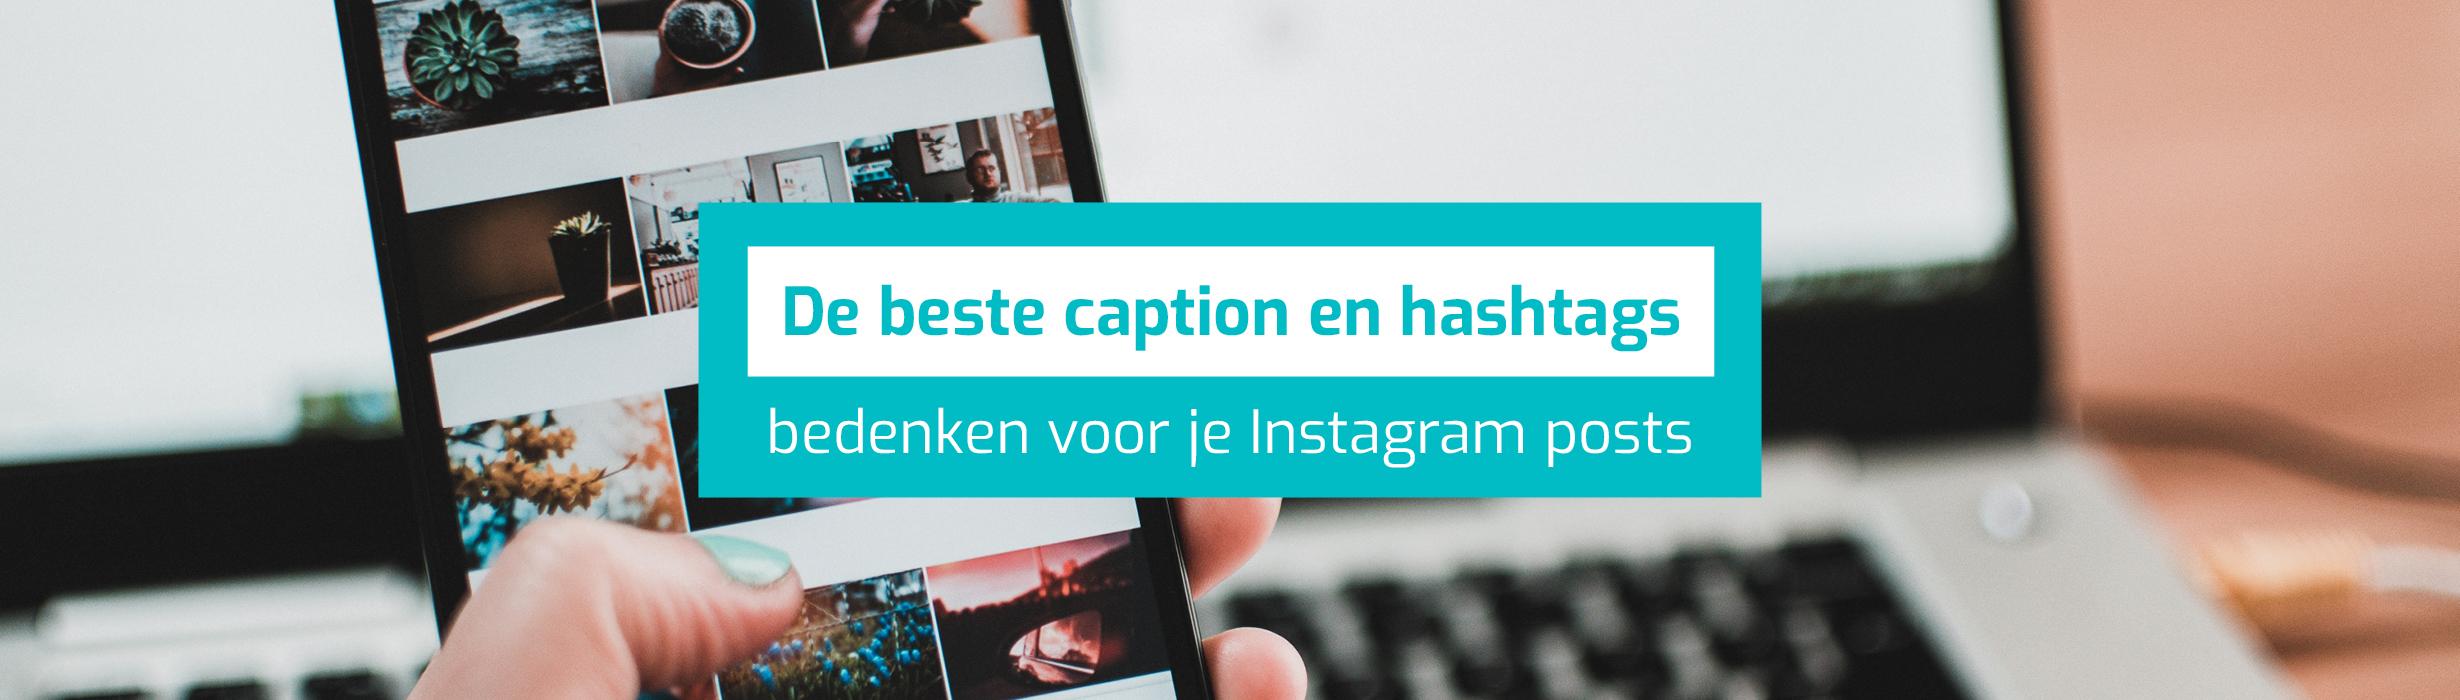 Beste captions Instagram posts MyParcel